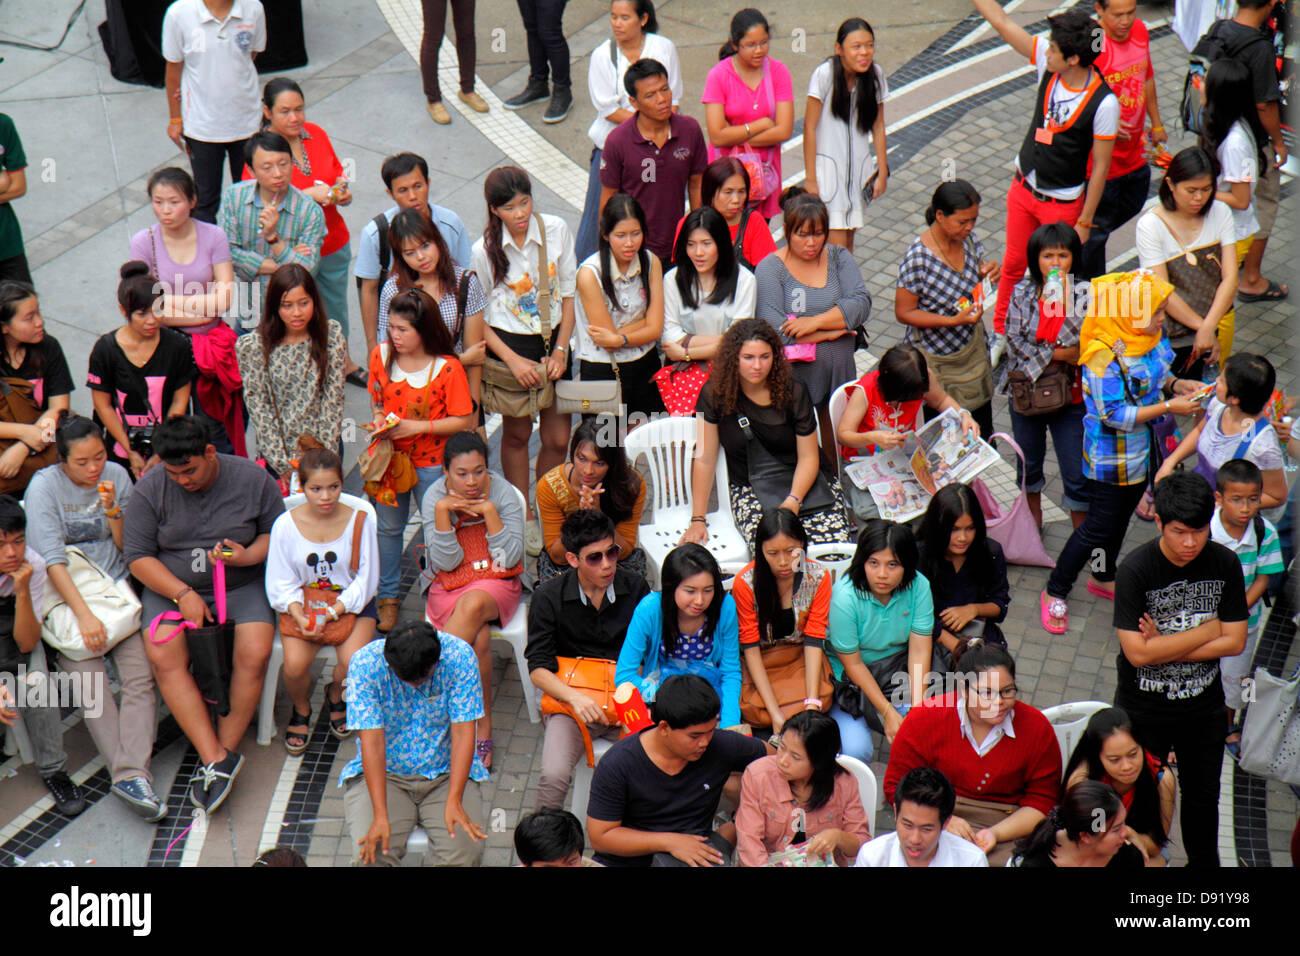 71743912 Bangkok Thailand Pathum Wan Rama 1 Road MBK Center centre event talent show  Asian man woman